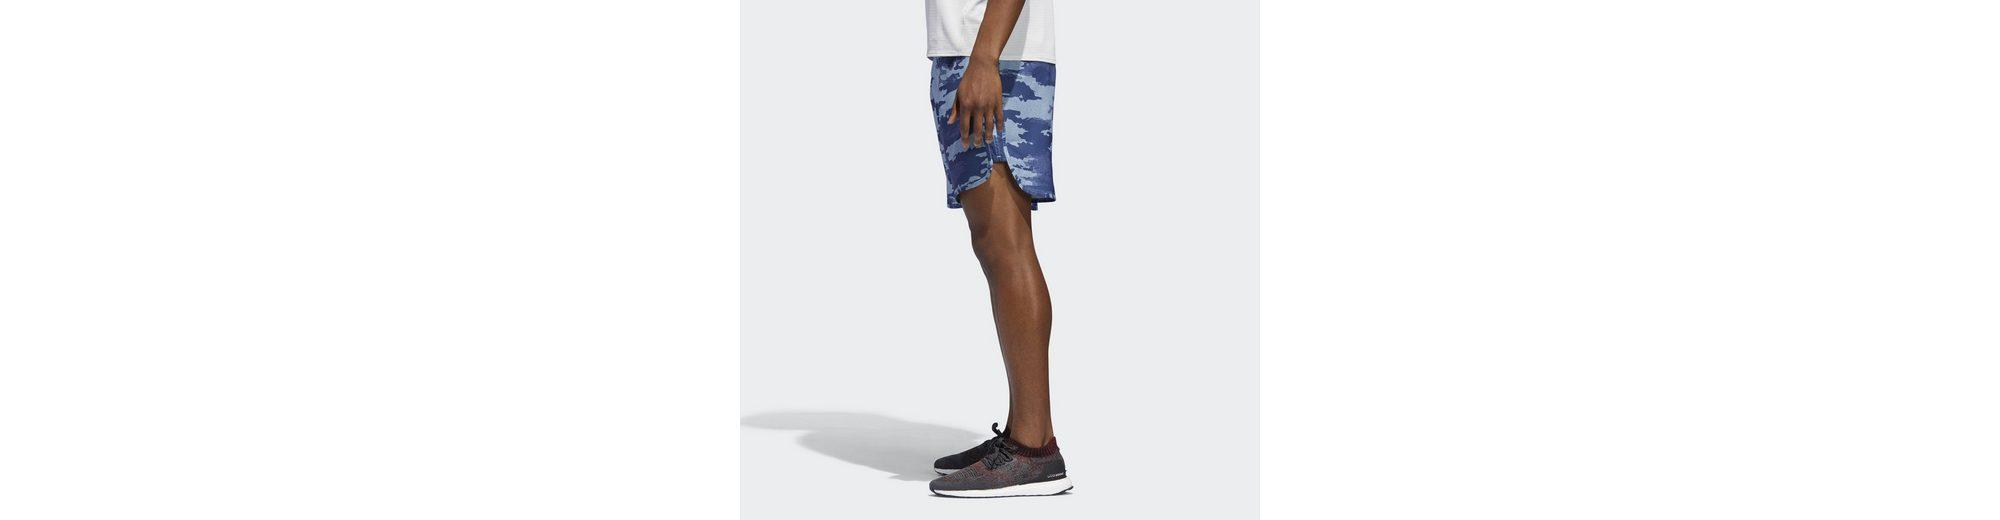 adidas Performance Shorts Supernova TKO Graphic Shorts Geschäft Zum Verkauf xNPwAuqAs